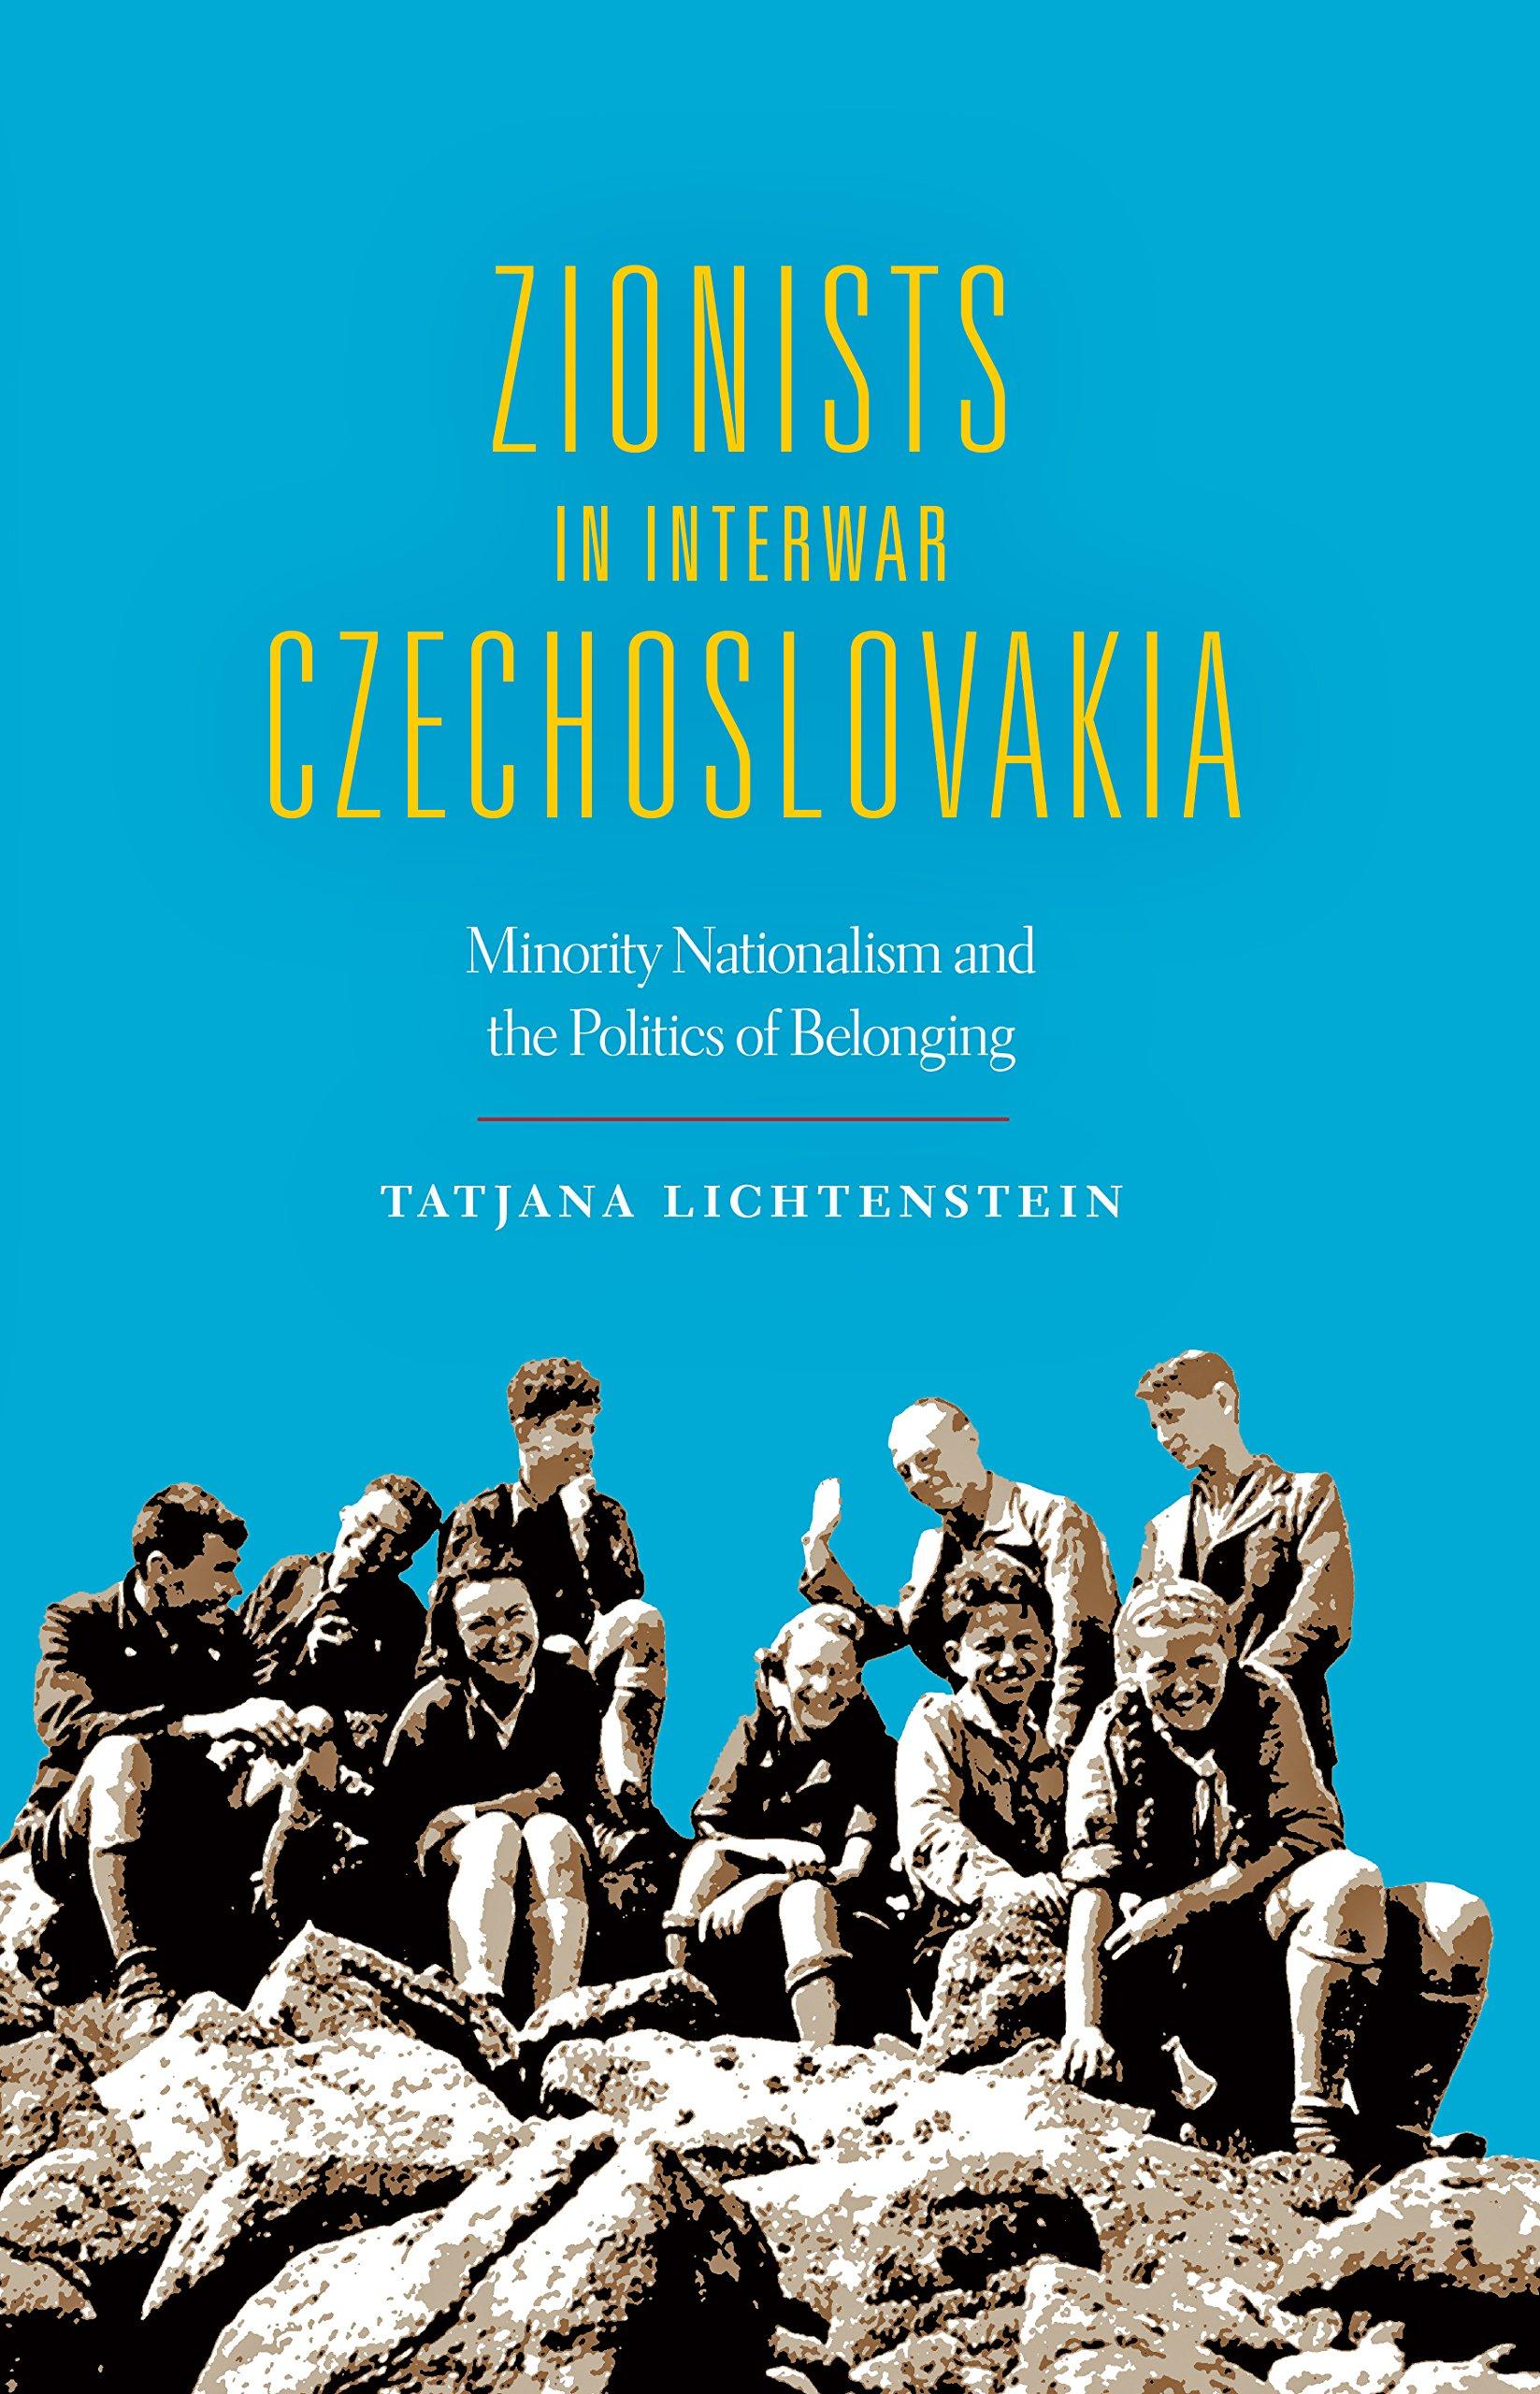 Zionists in Interwar Czechoslovakia: Minority Nationalism and the Politics of Belonging (The Modern Jewish Experience) PDF